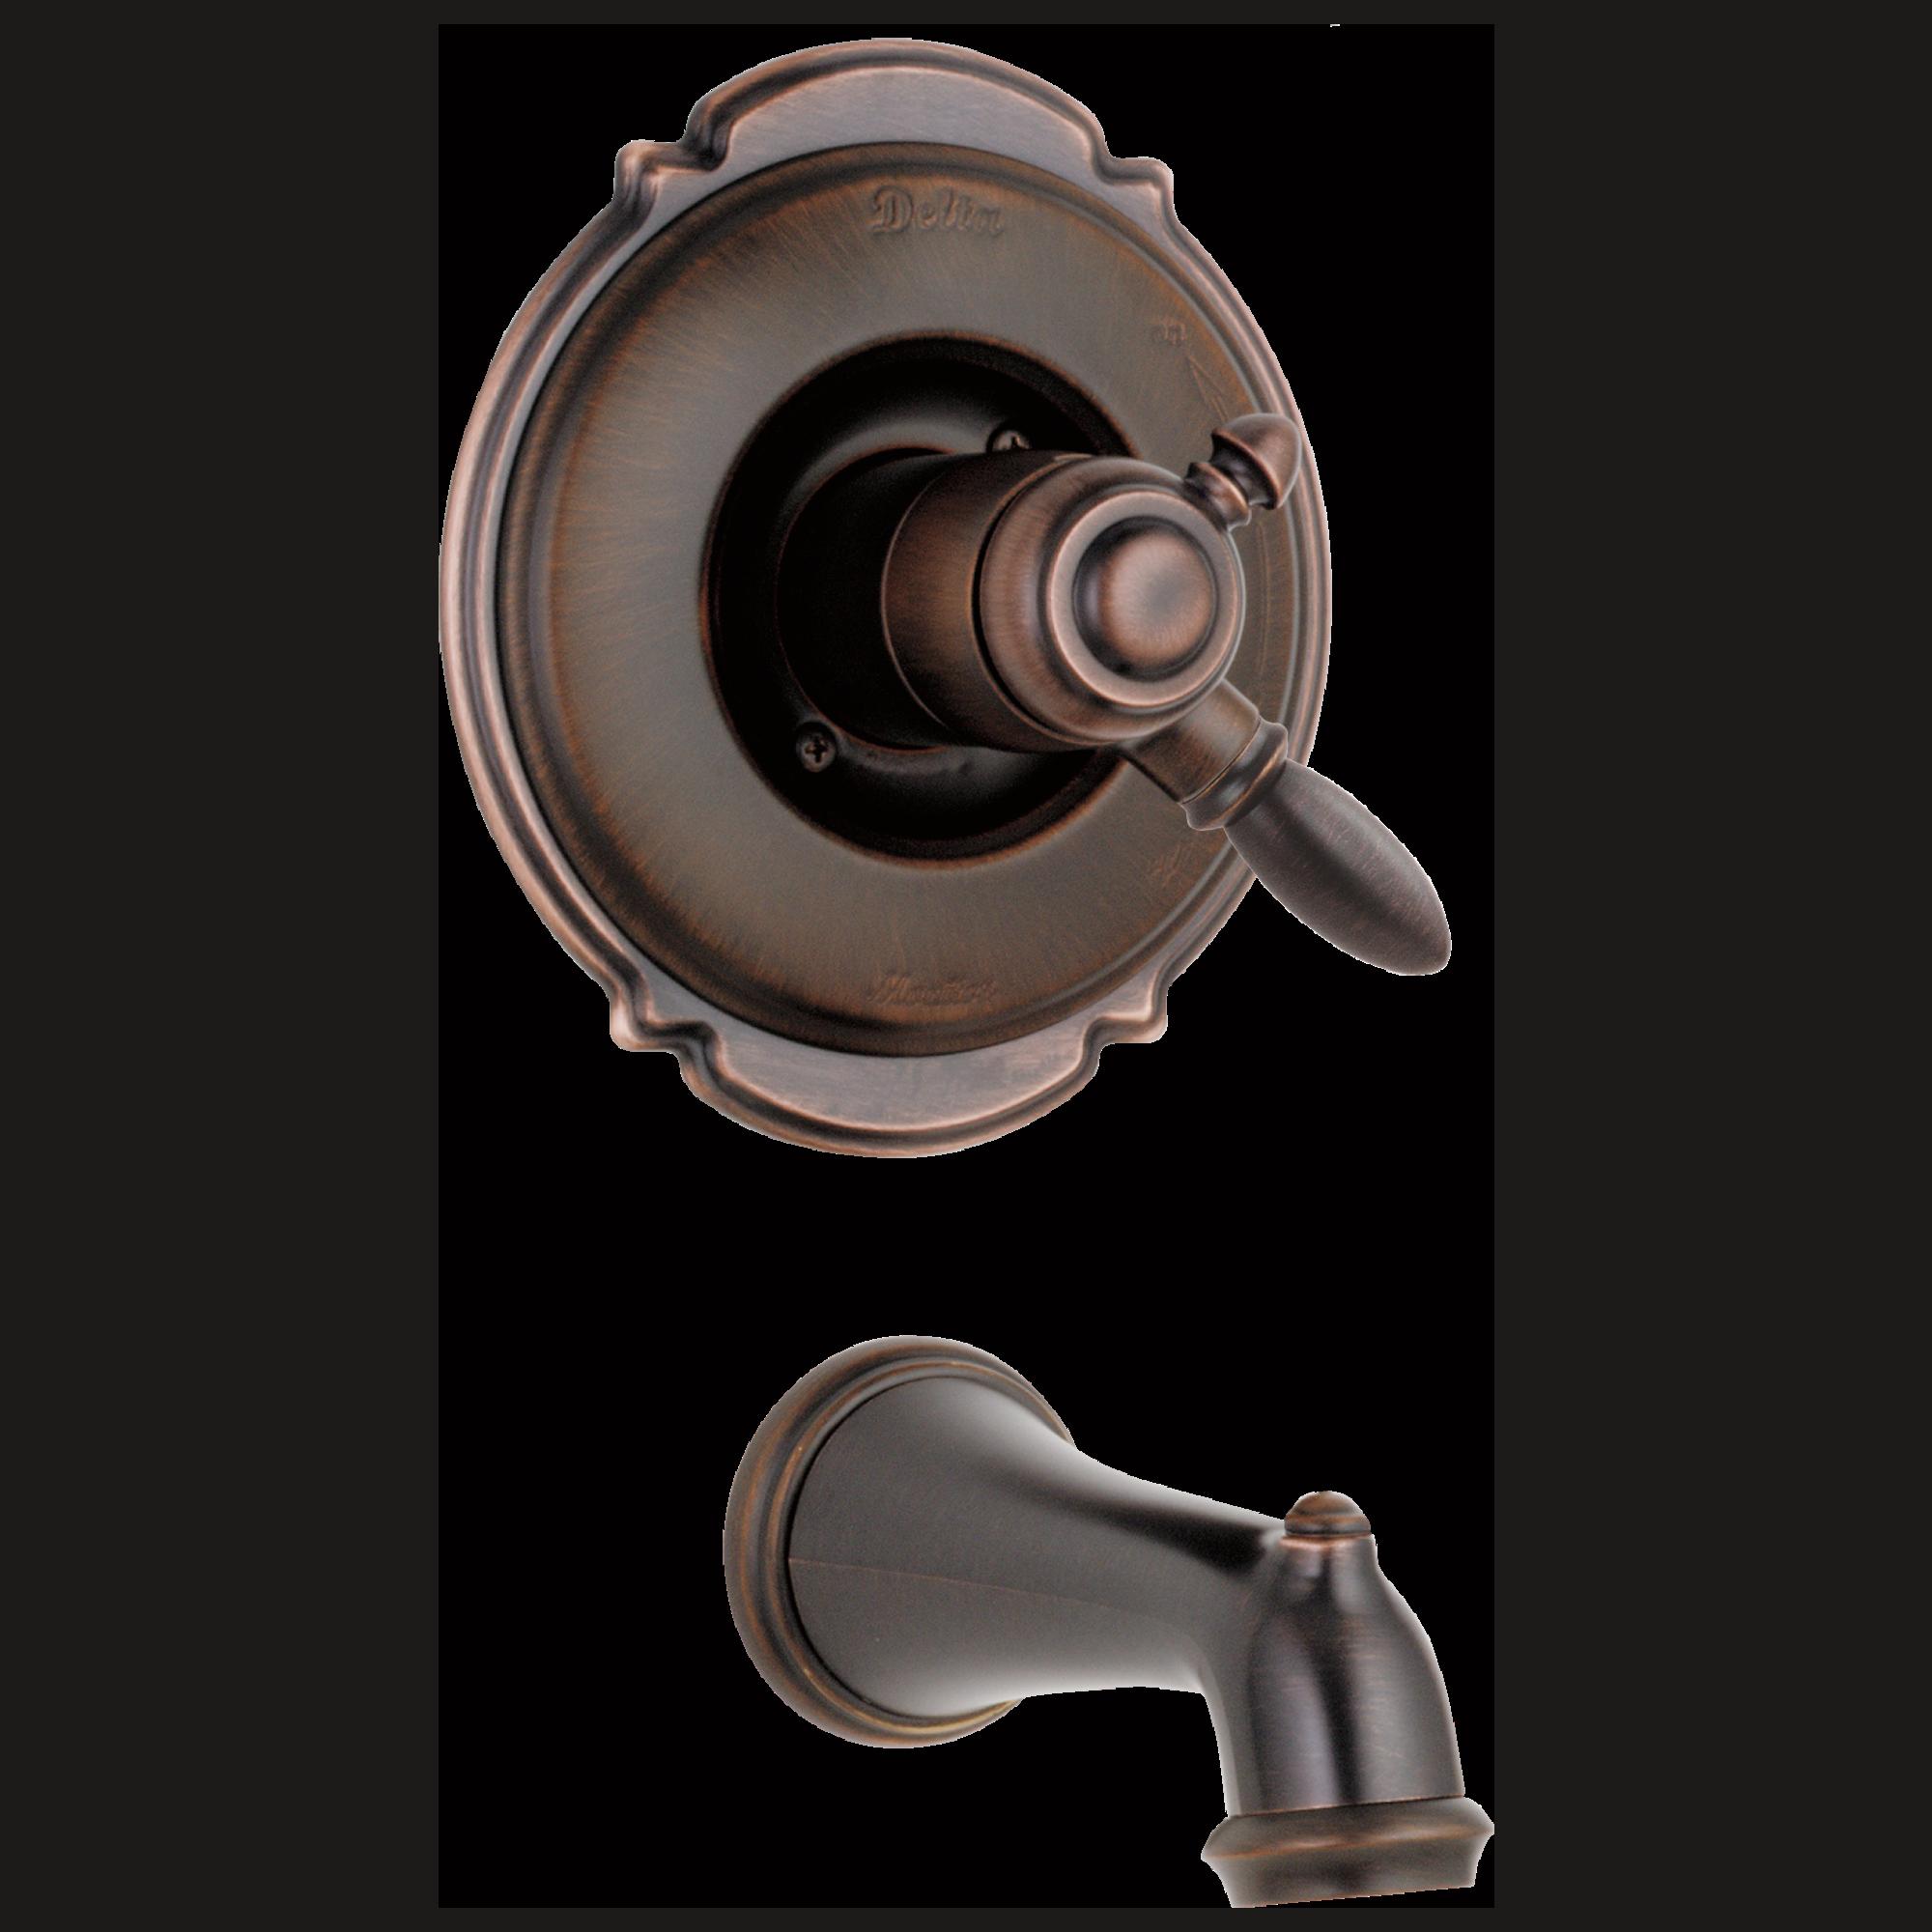 Delta Faucet T17155 Rb Monitor 17 Series Tub Trim Venetian Bronze Faucet Bronze Delta Faucets